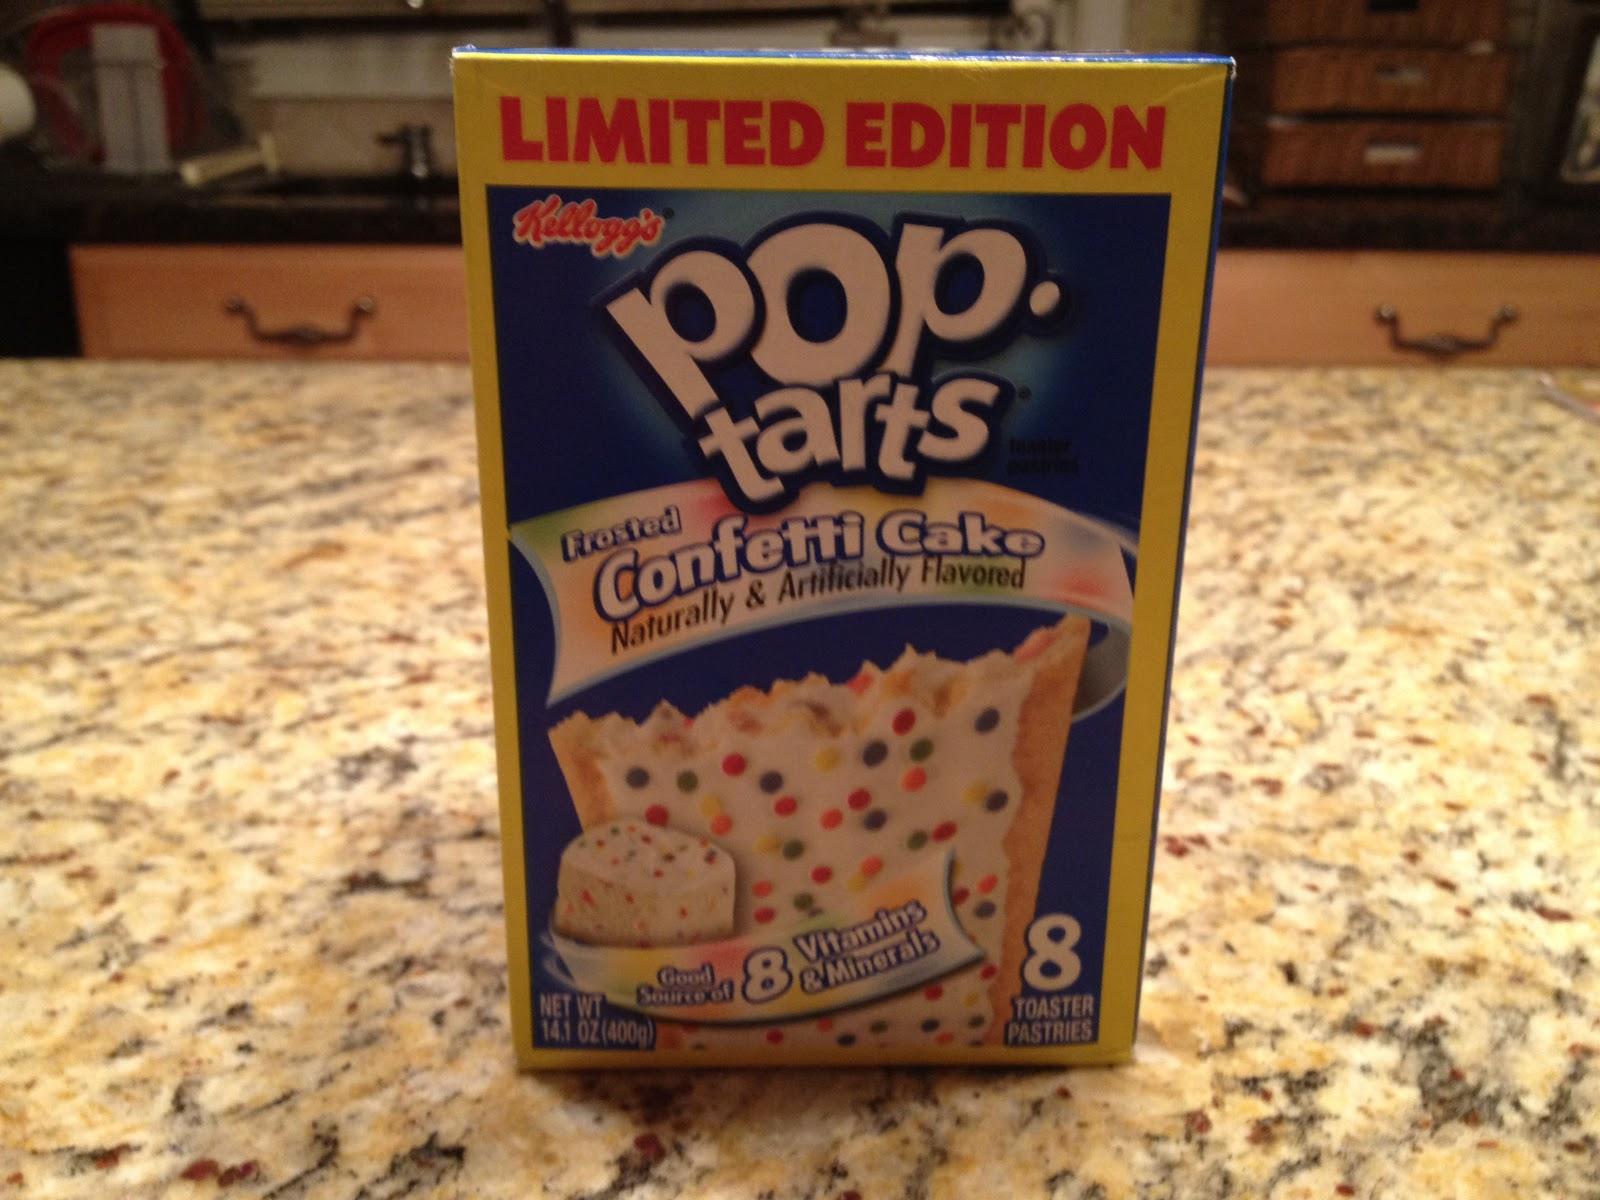 Kelloggs Limited Edition Confetti Cake Pop Tarts